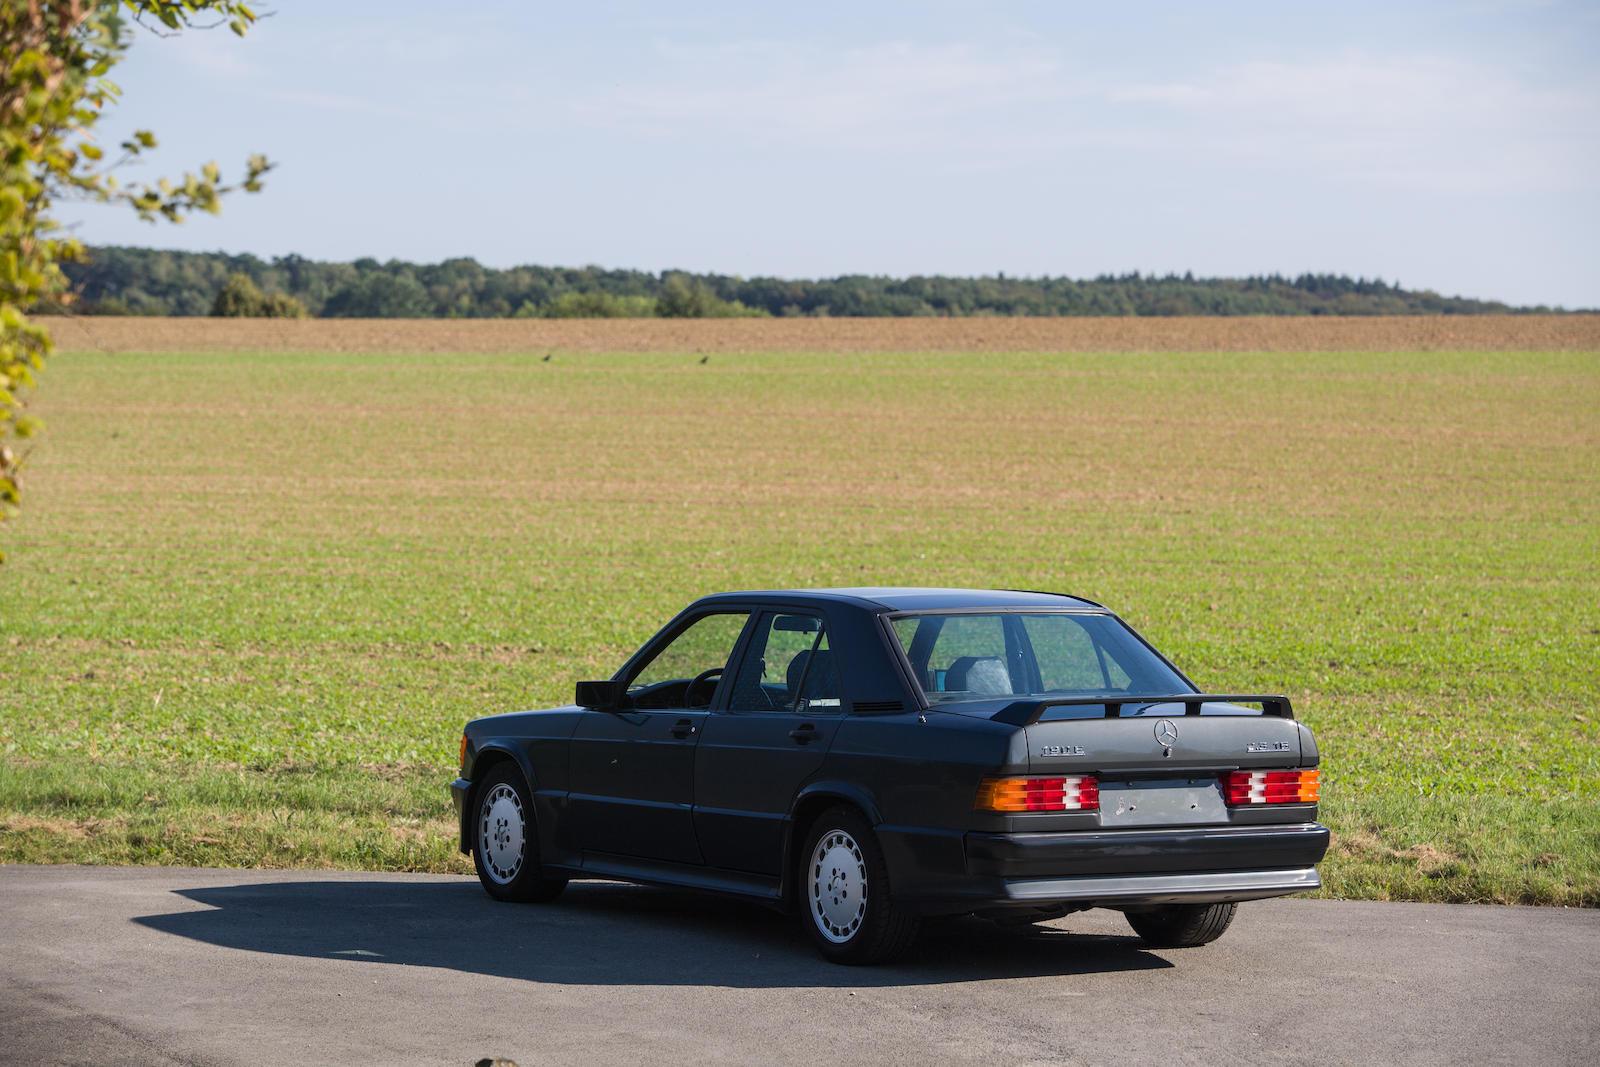 1985 Mercedes-Benz 190E 2.3-16 Sports Saloon rear 3/4